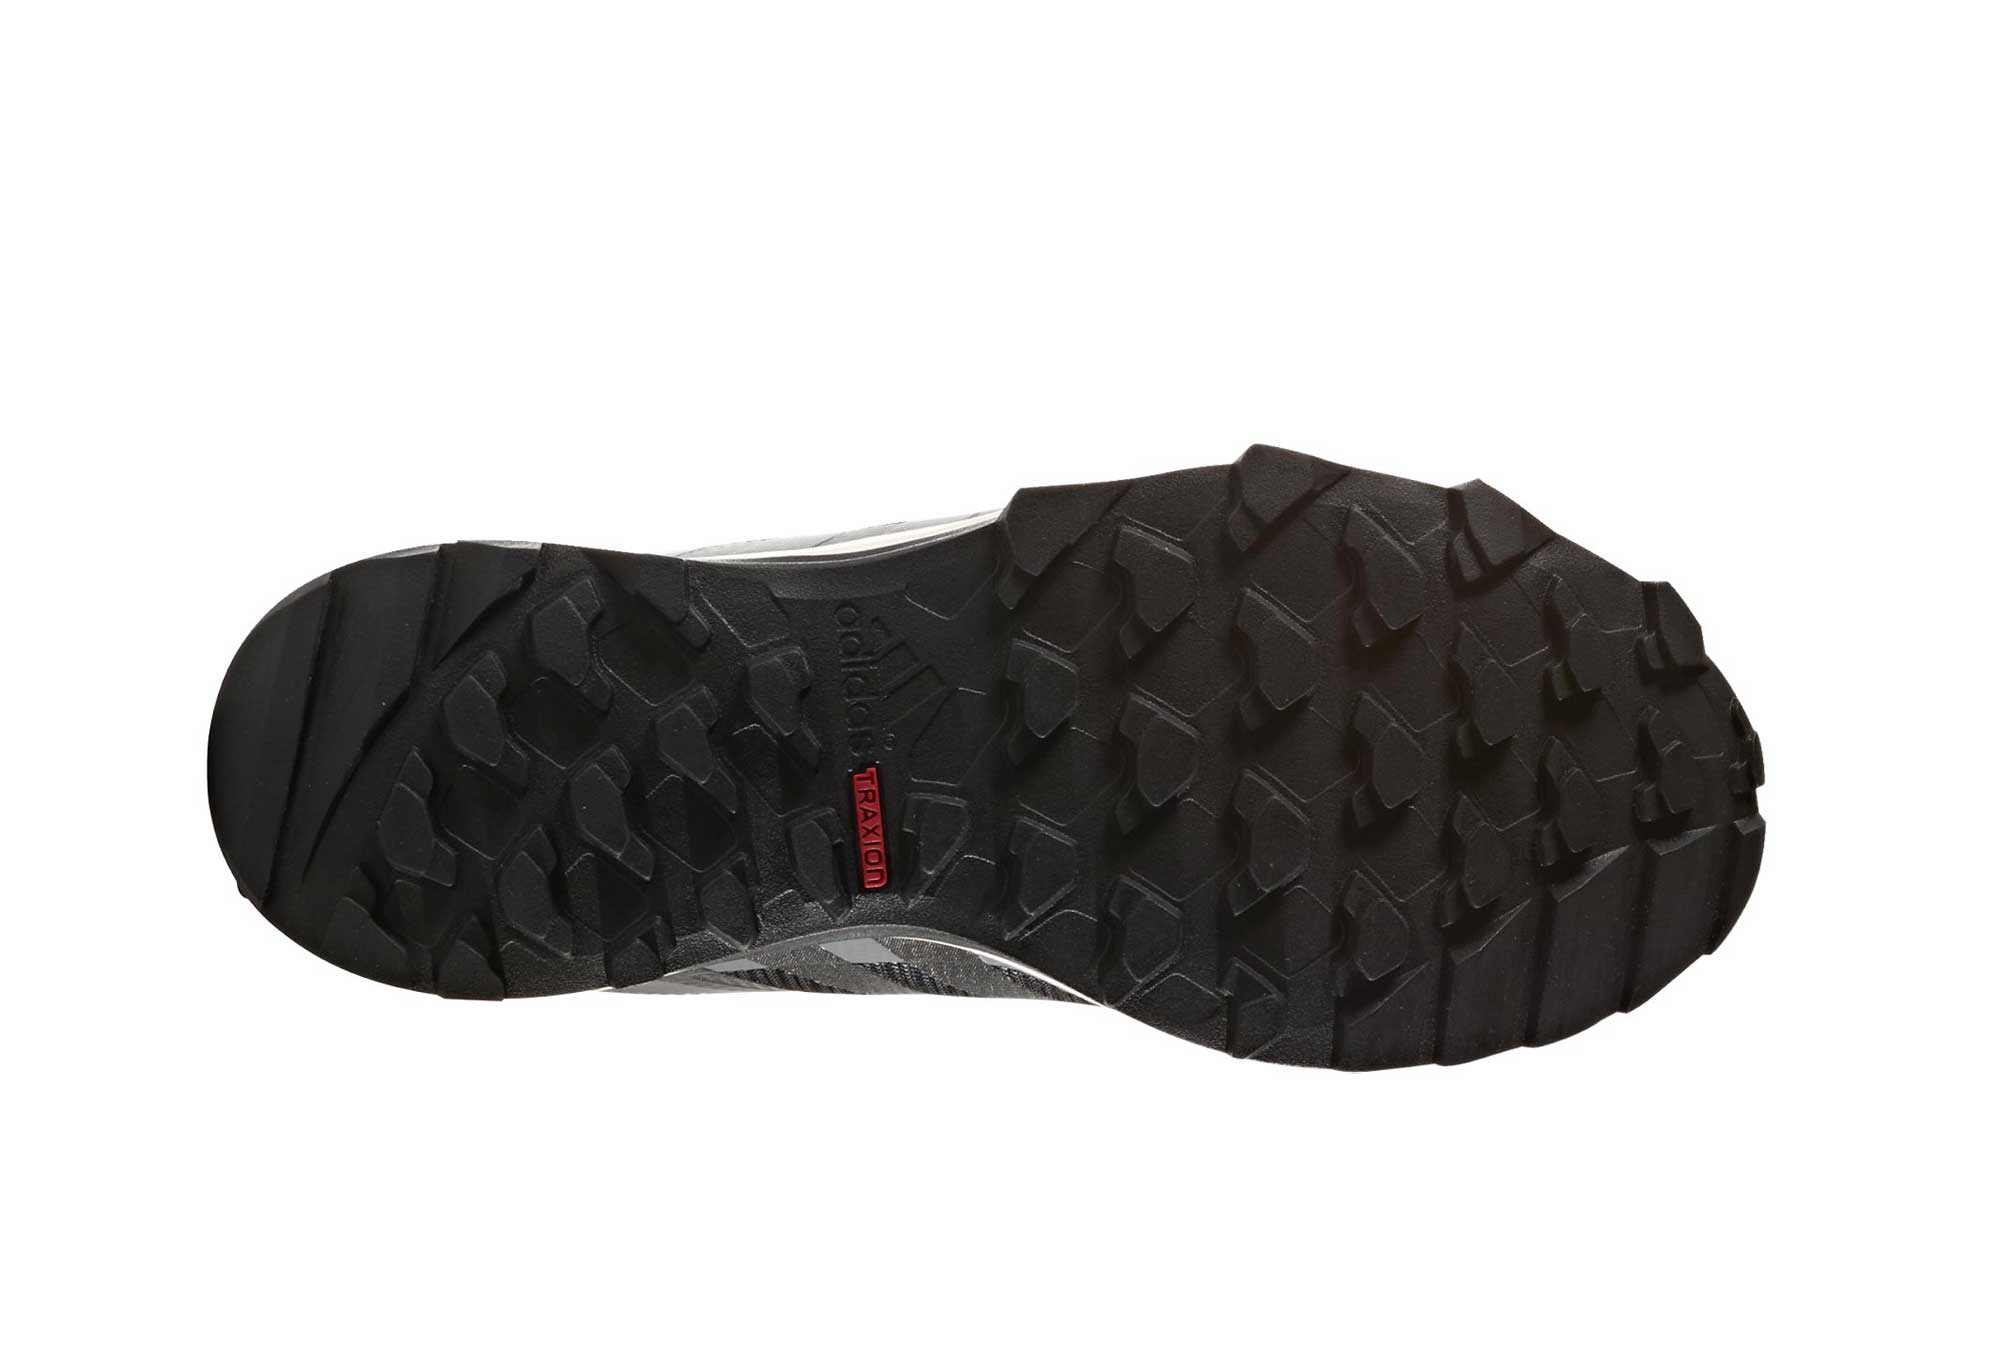 size 40 70ca9 023ea Chaussures de Trail Femme adidas running Kanadia 7 Trail GTX Gris   Noir